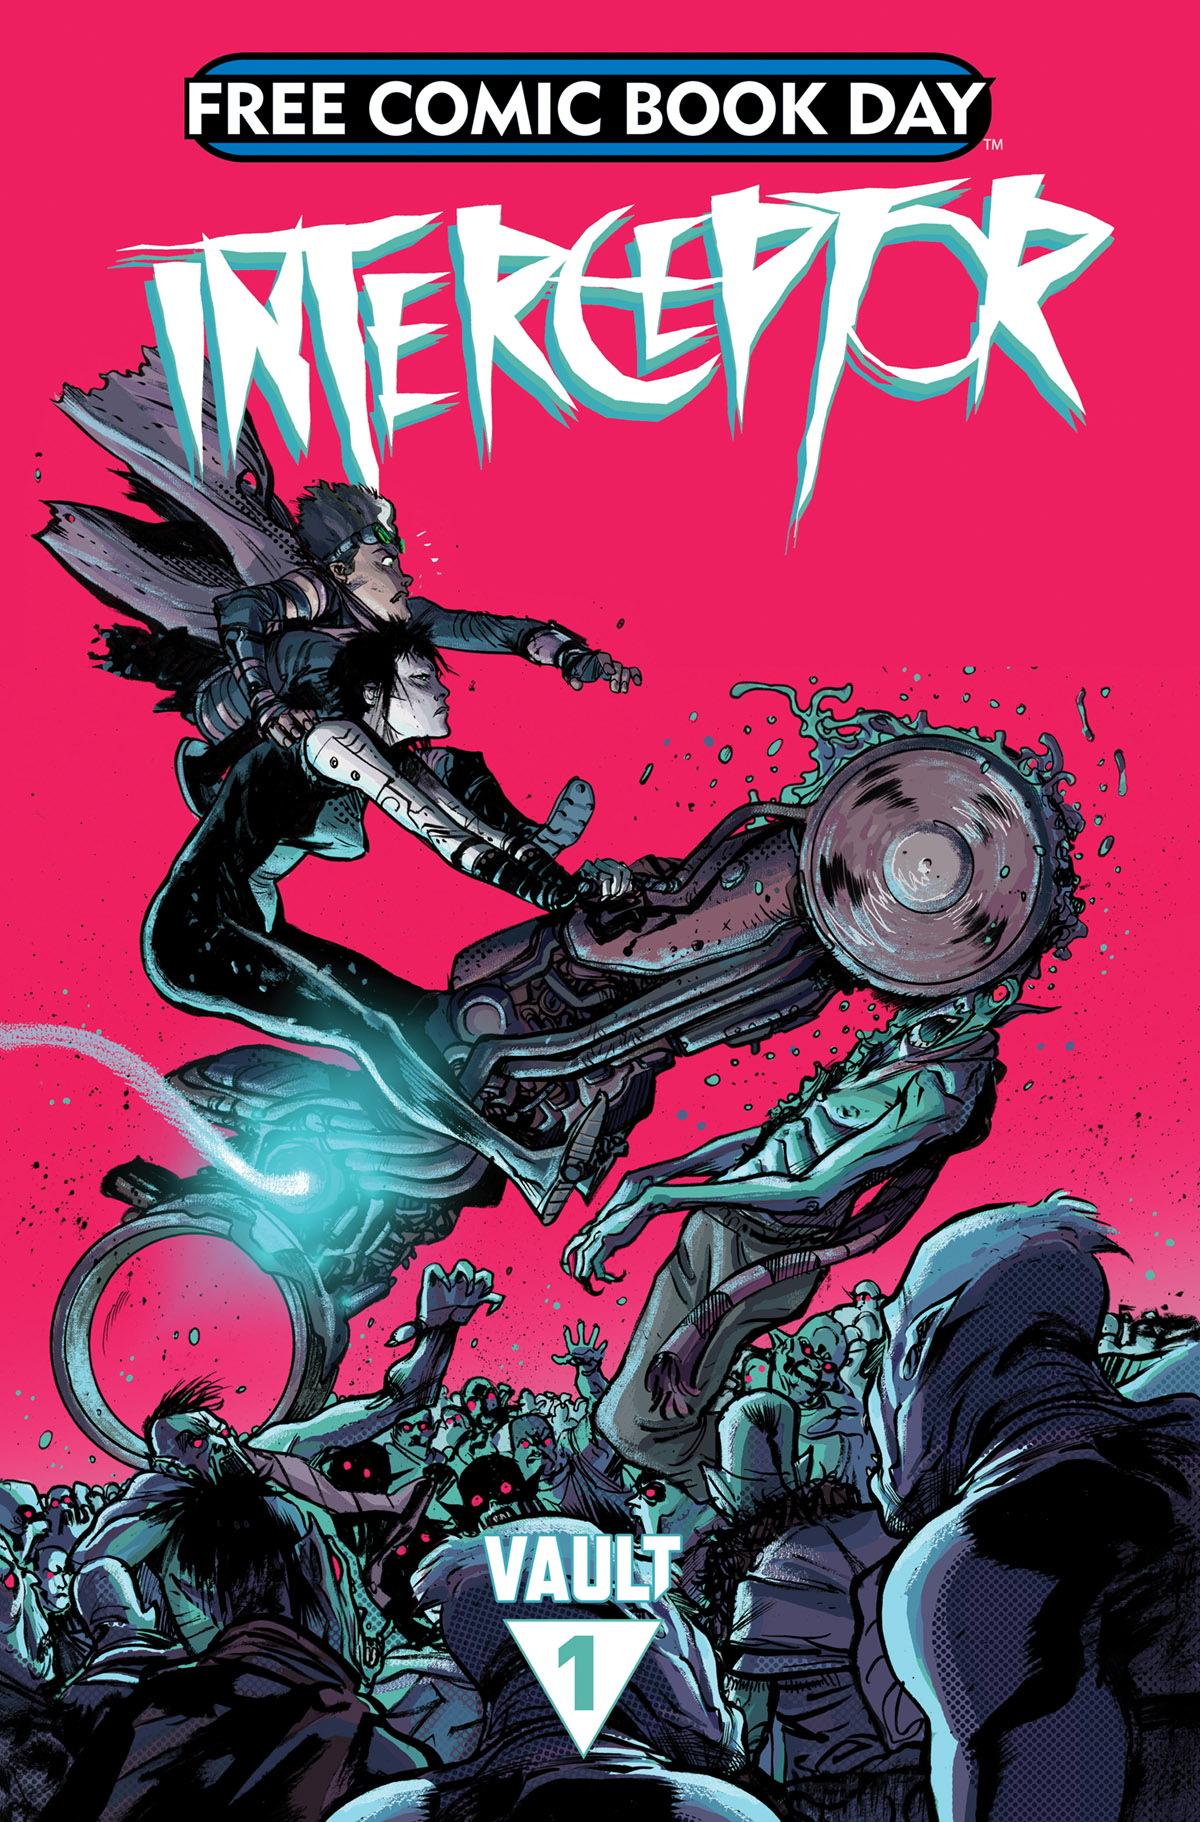 FCBD19_G_Vault Comics_Interceptor #1_2